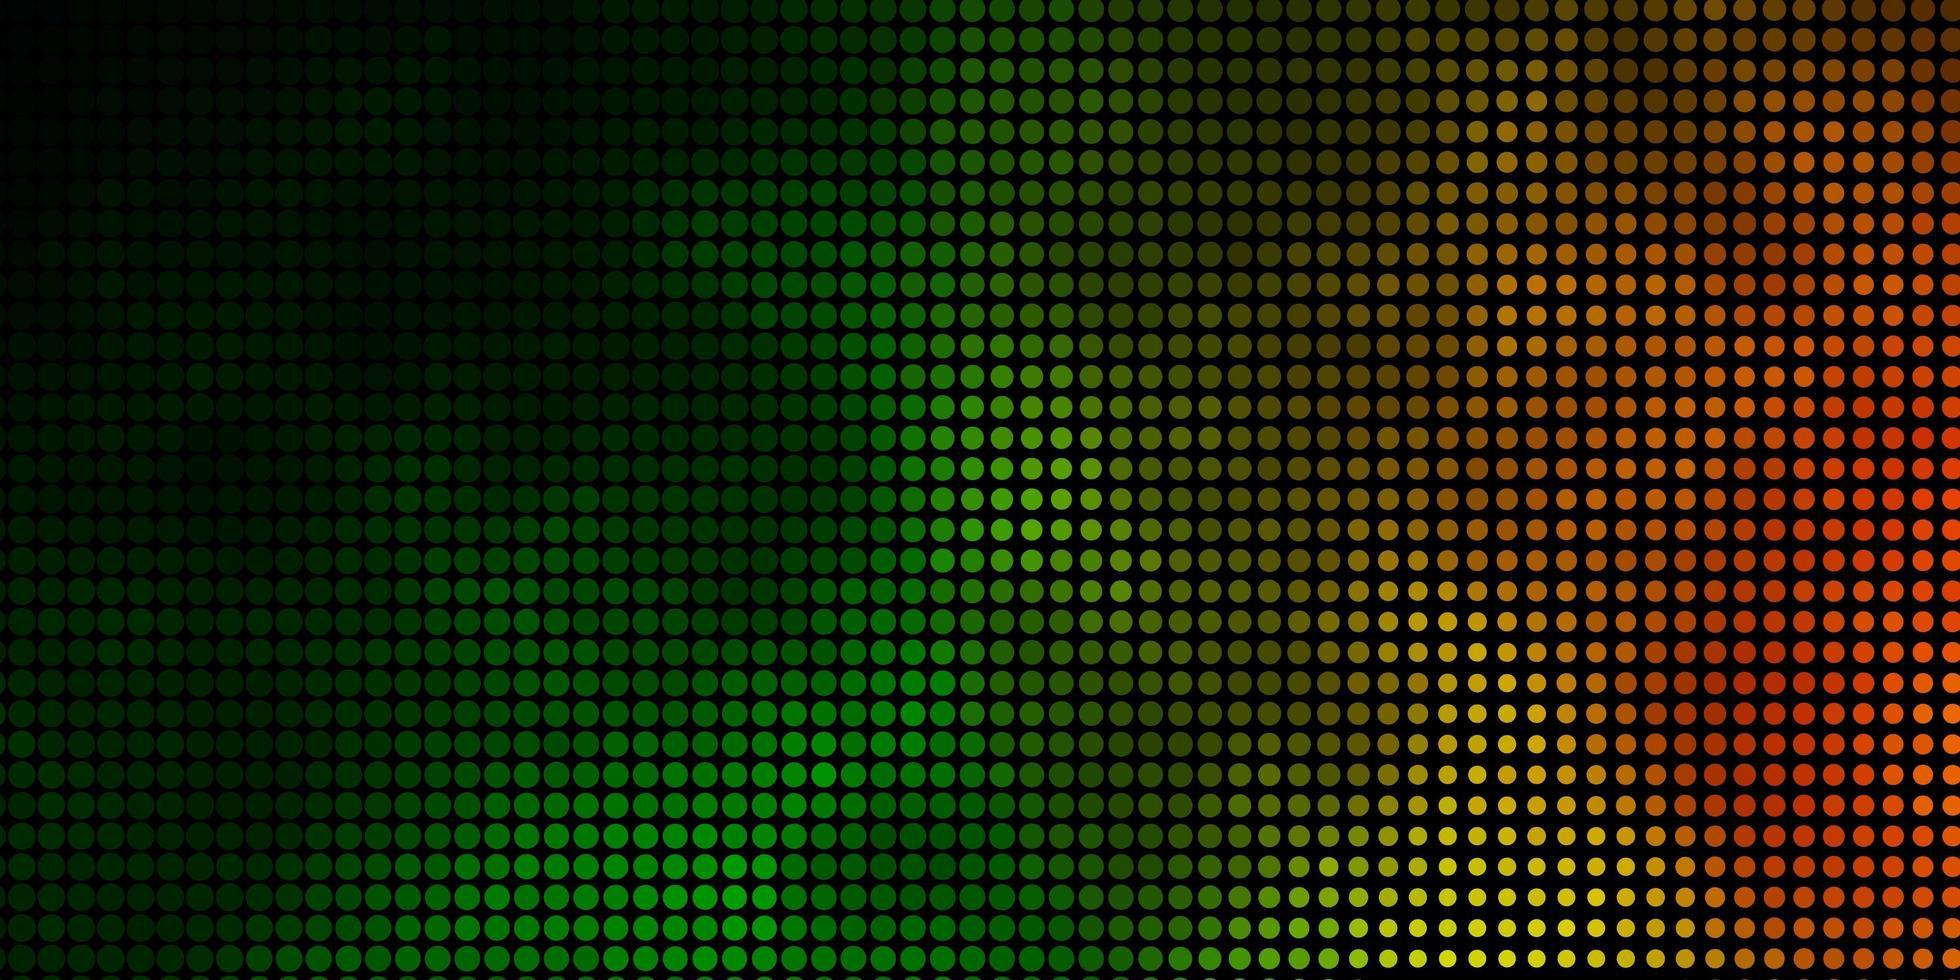 donkergroene, rode vectorlay-out met cirkelvormen. vector